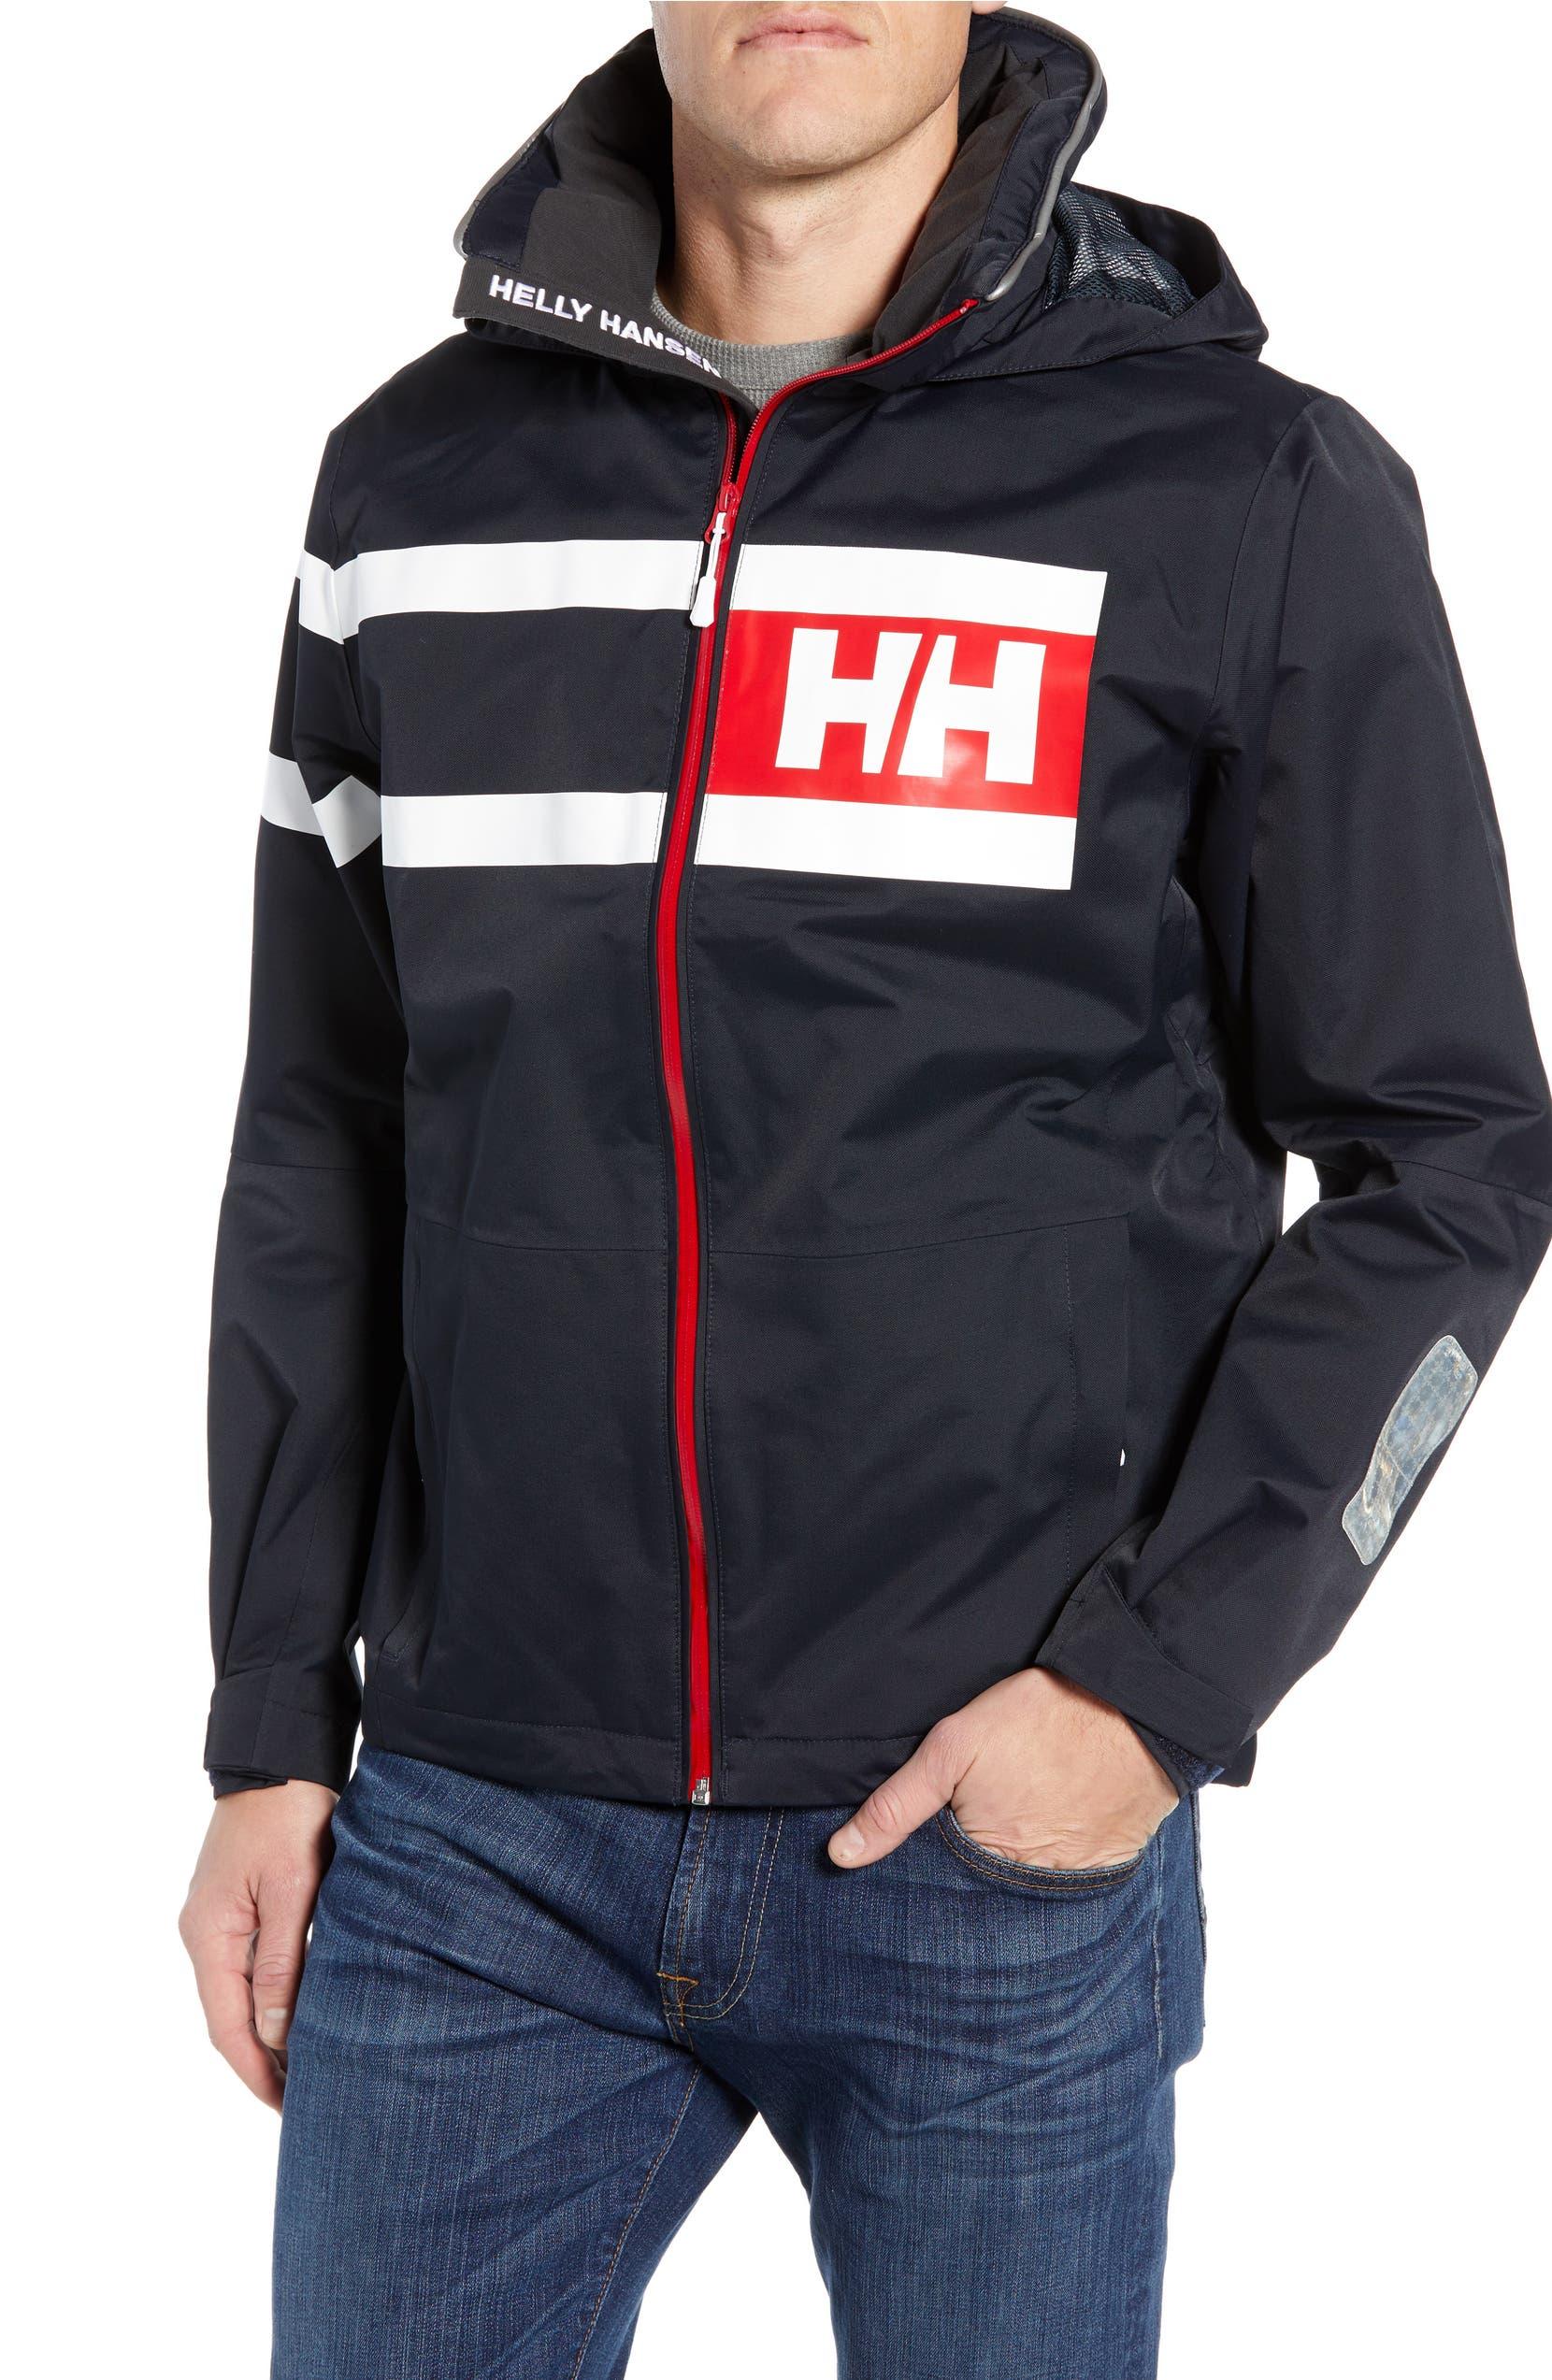 6c252841 Helly Hansen Salt Power Hooded Jacket | Nordstrom